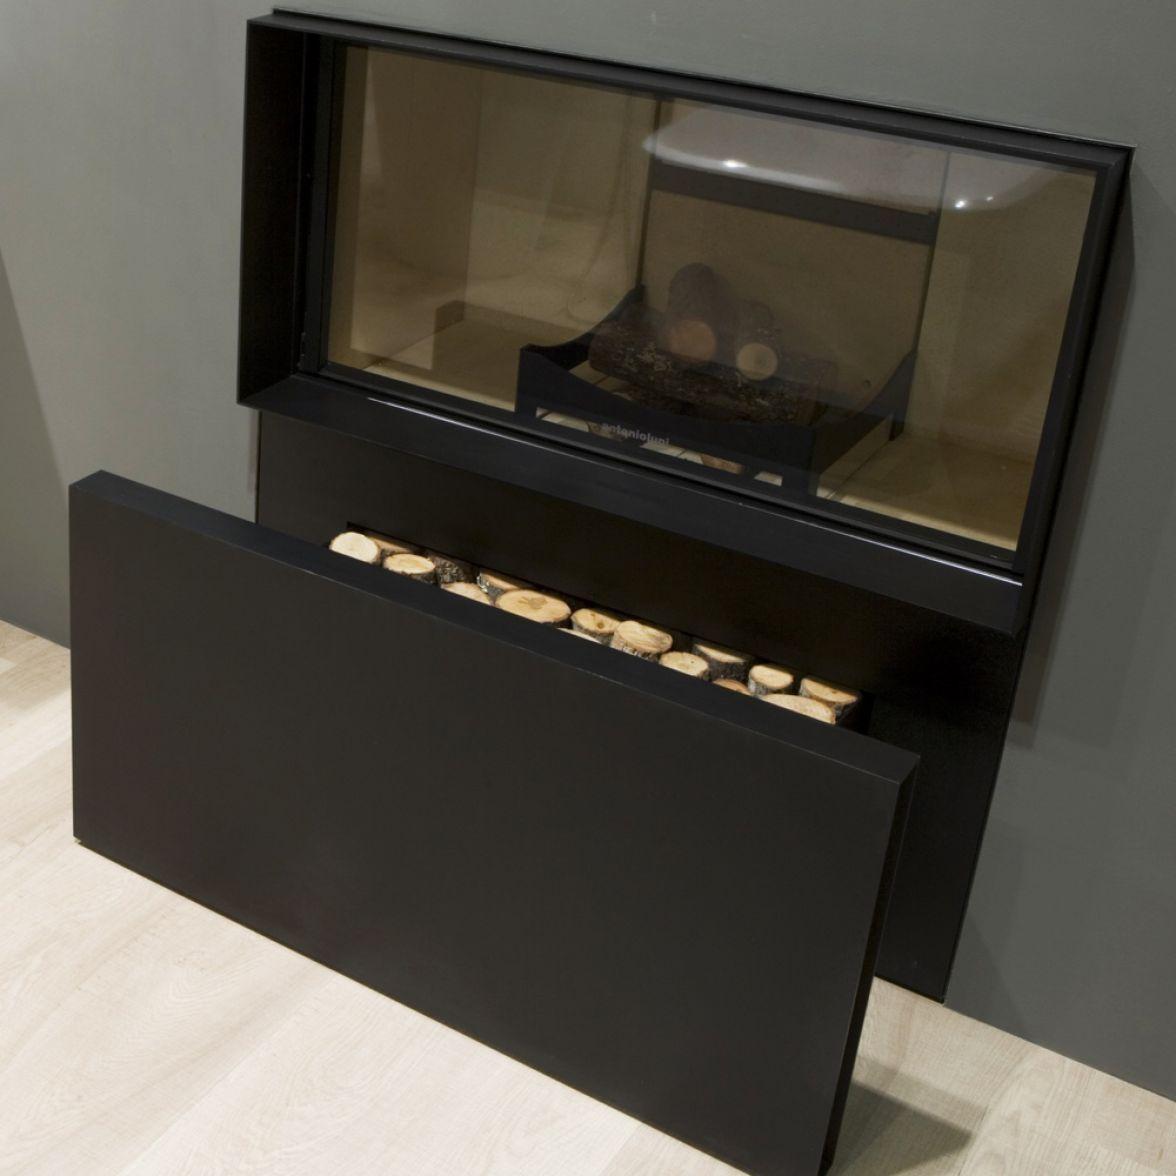 Skemabox Fireplace фото цена